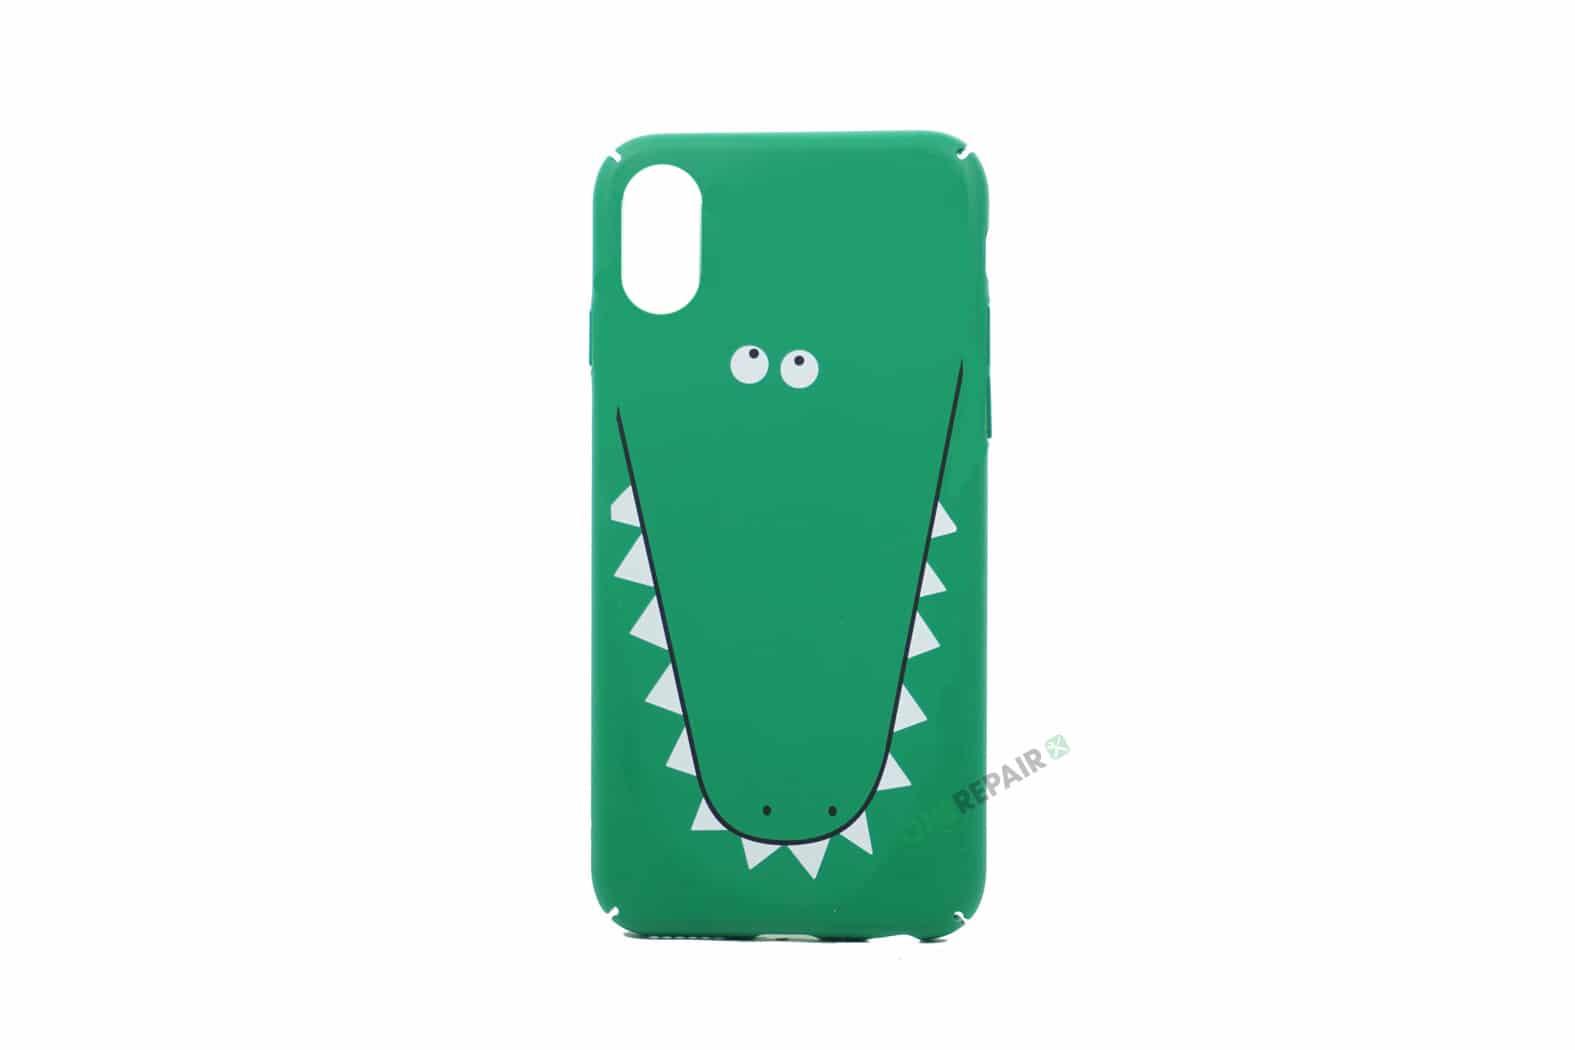 351945_iPhone_x_XS_Plastik_Krokodille_Motiv_Cover_Groen_OneRepair_00001